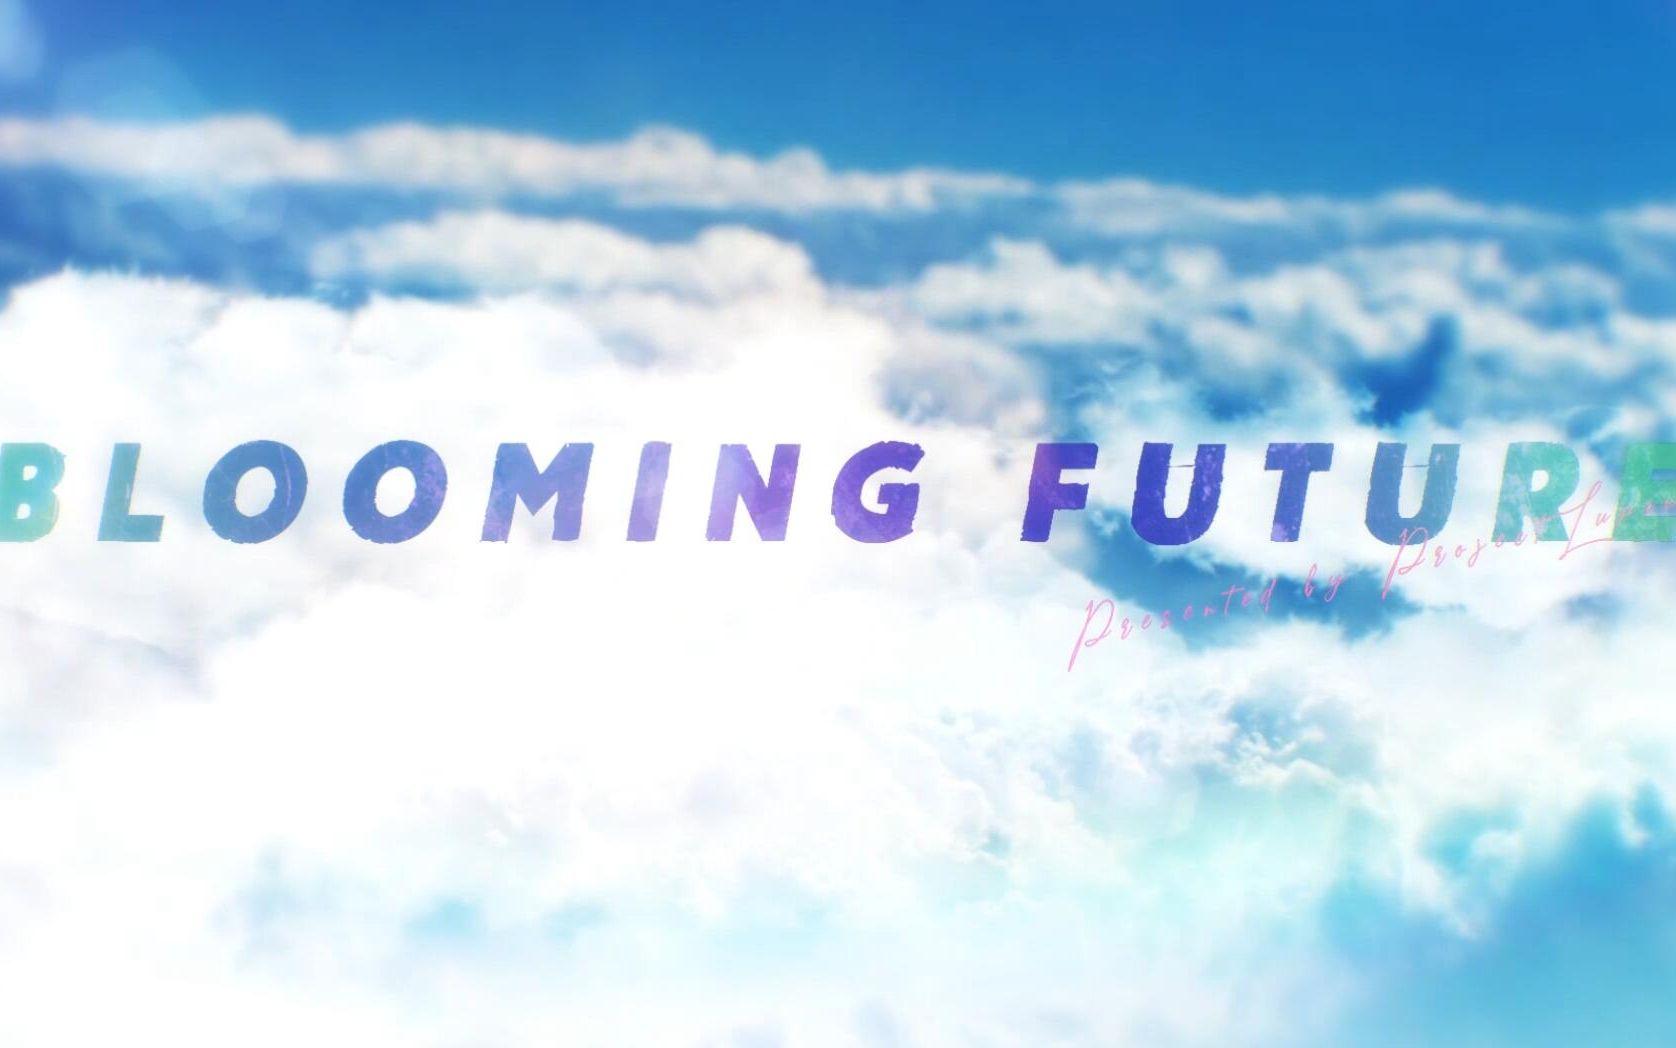 【原创曲】Blooming Future 日语ver.【Project Lupinus一周年纪念】_哔哩哔哩_bilibili